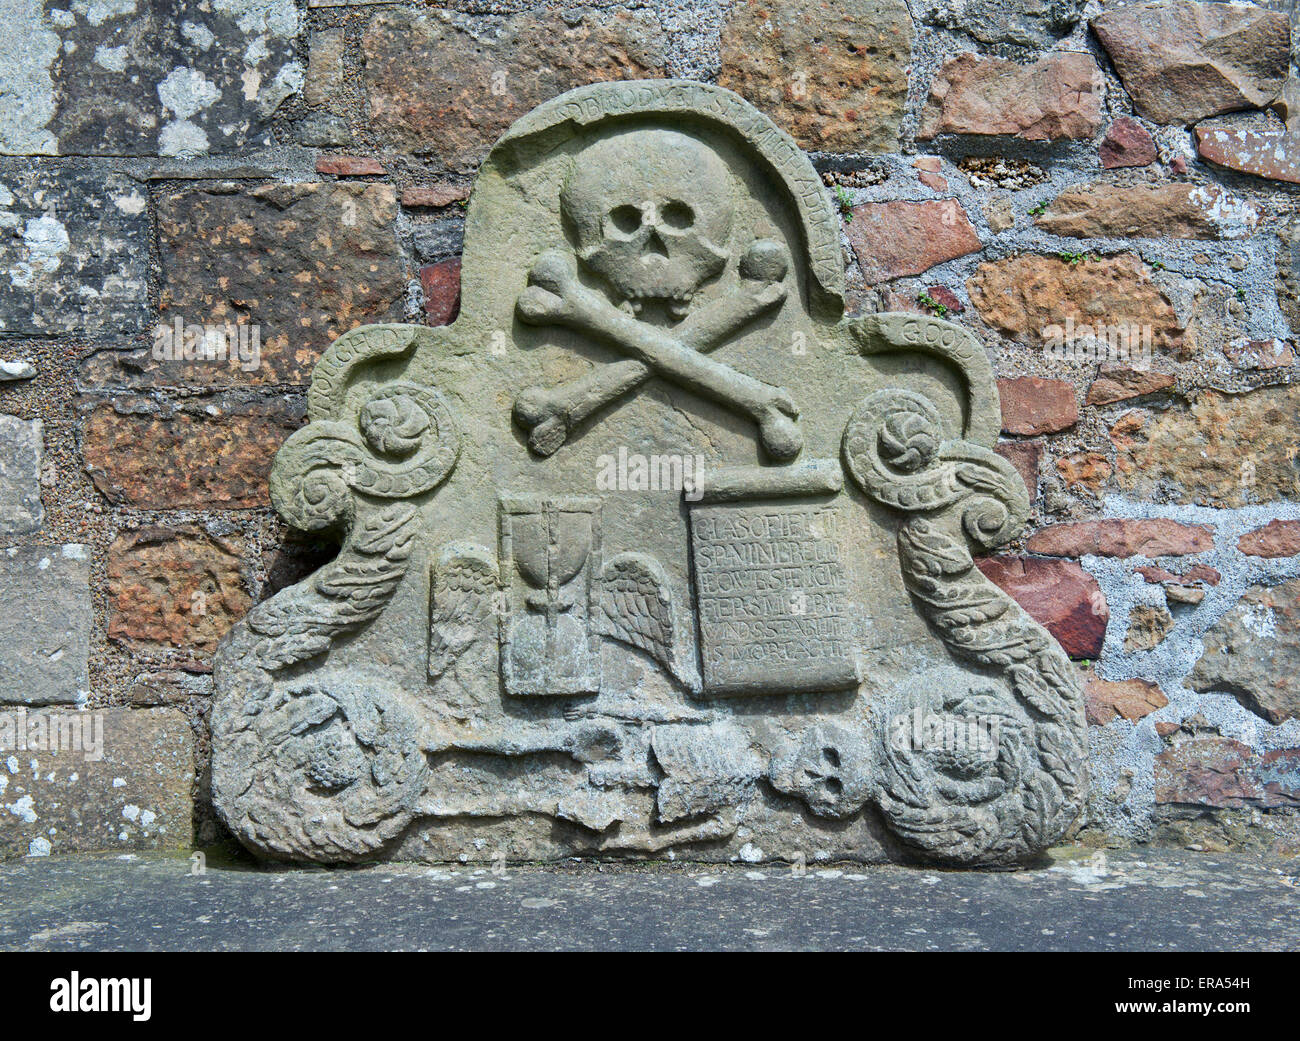 Skull and crossbones on memorial, in churchyard, UK - Stock Image